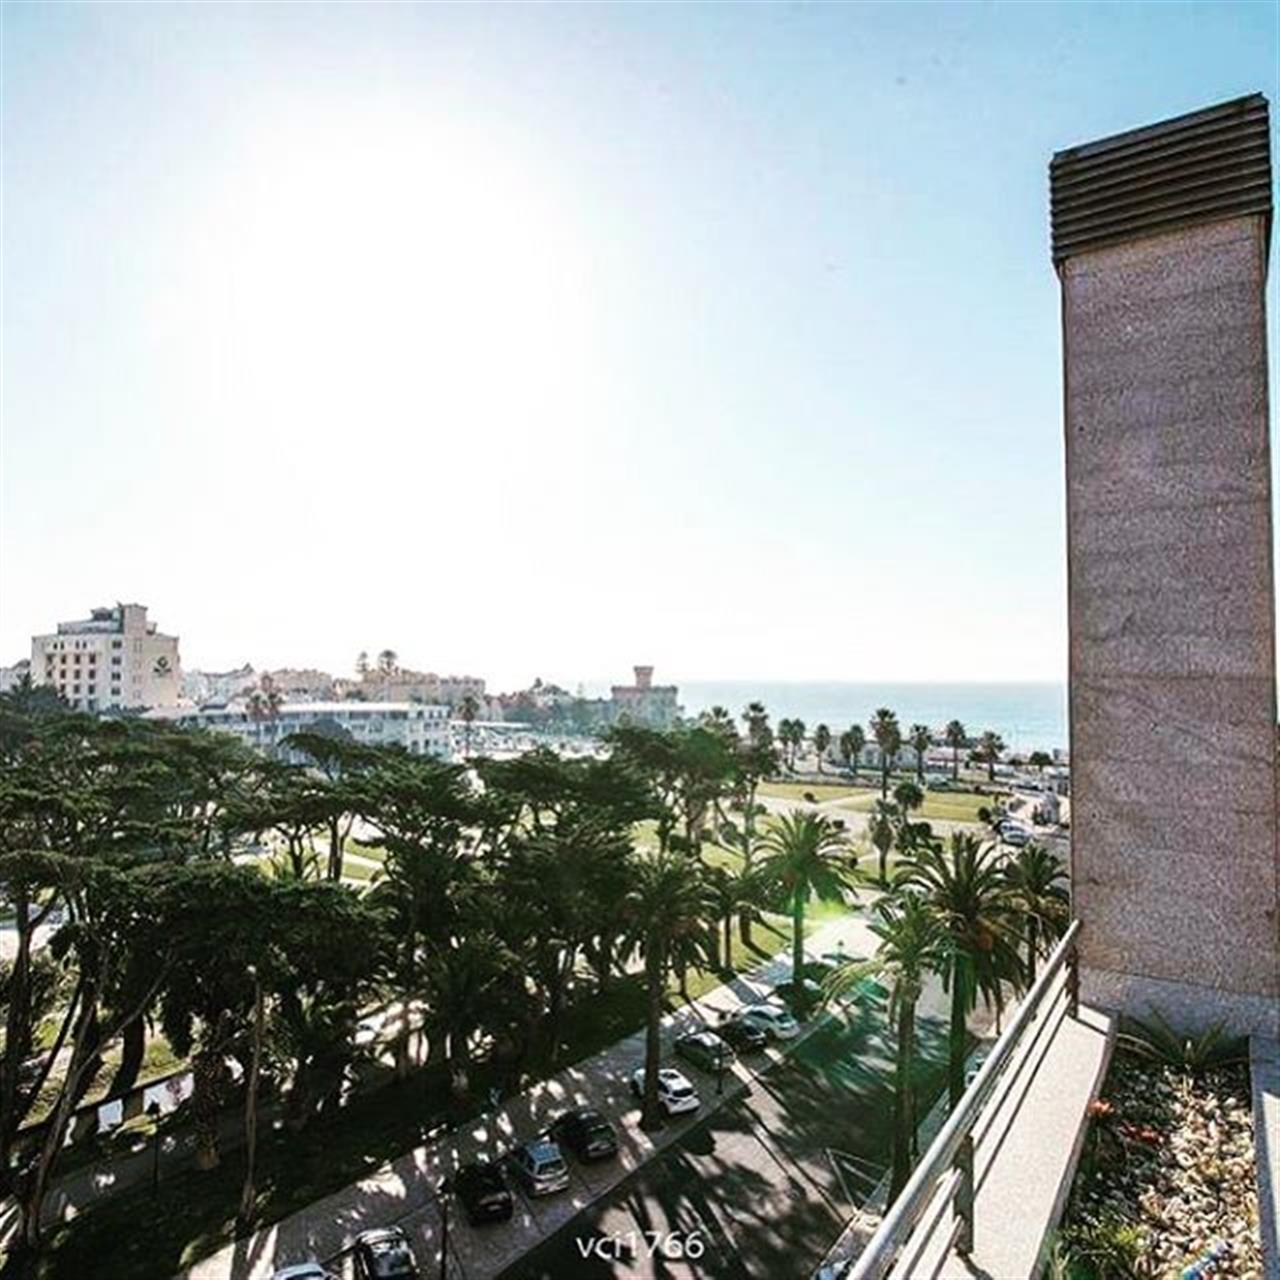 Saiba a que im├│vel pertence esta vista em www.ins.pt | Ref. VCI1766 #insrealestateportugal #leadingrelocal #view #estoril #portugal